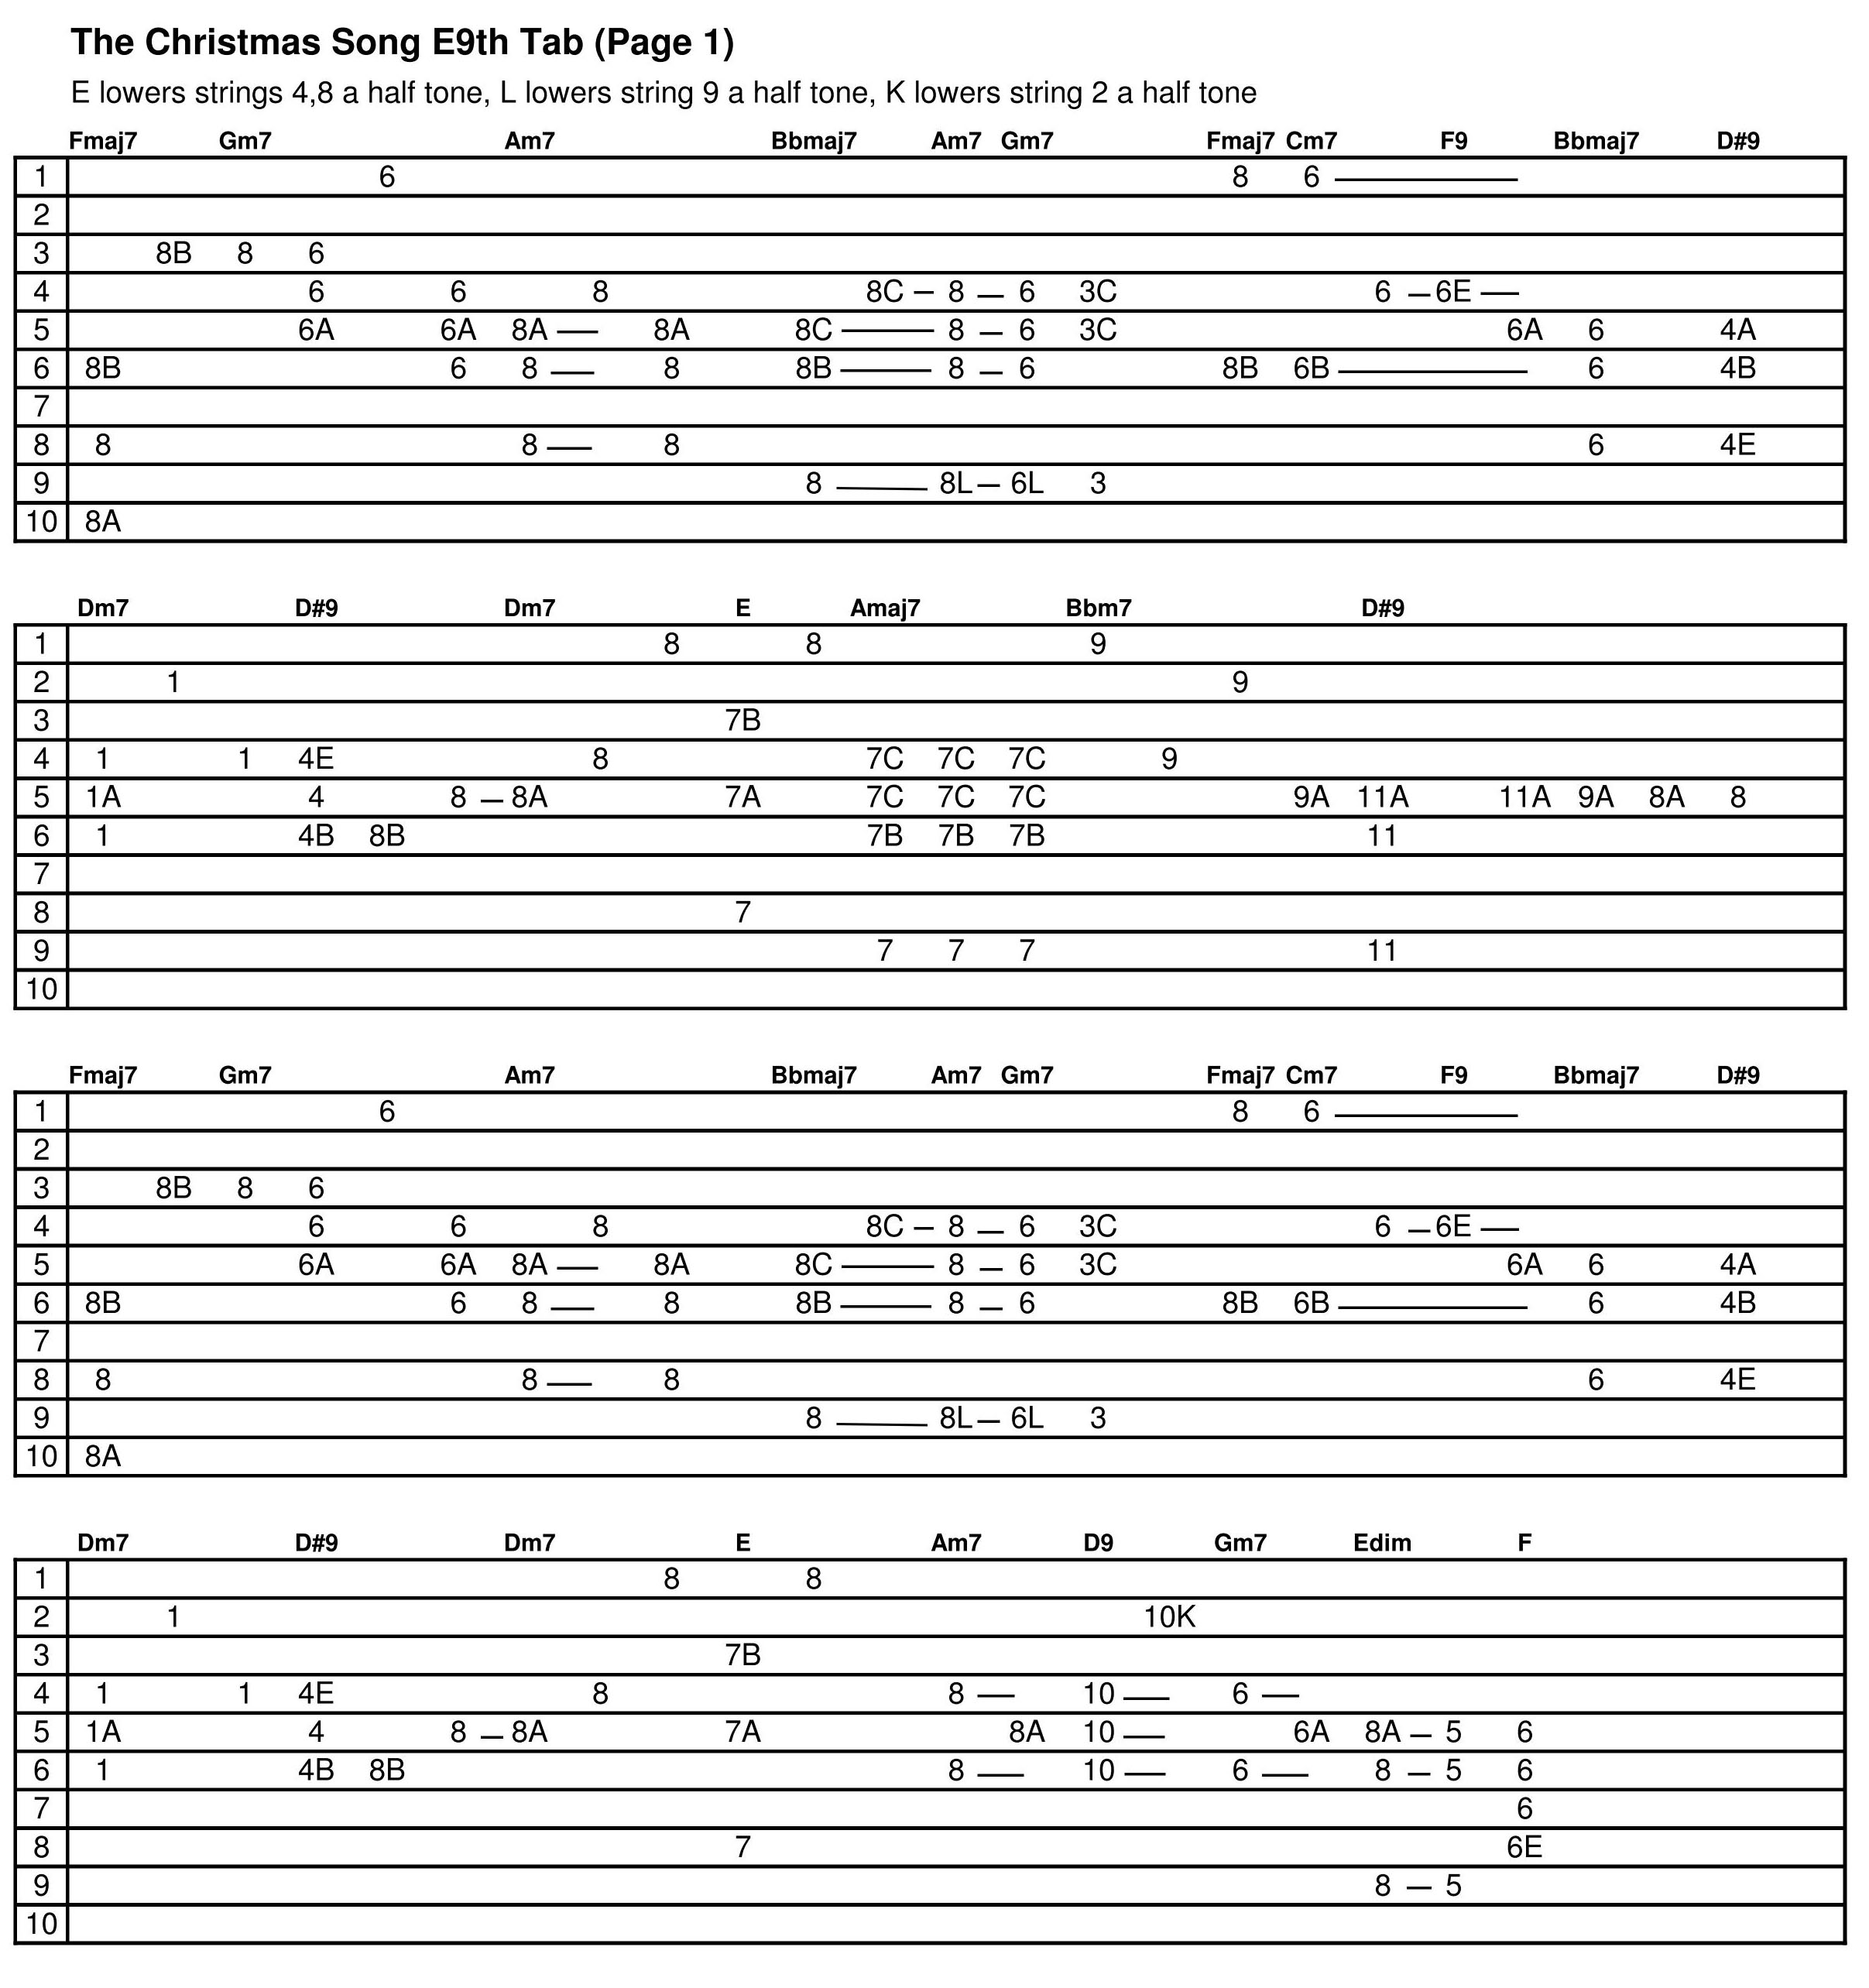 The Christmas Song Tab Chords Tracks